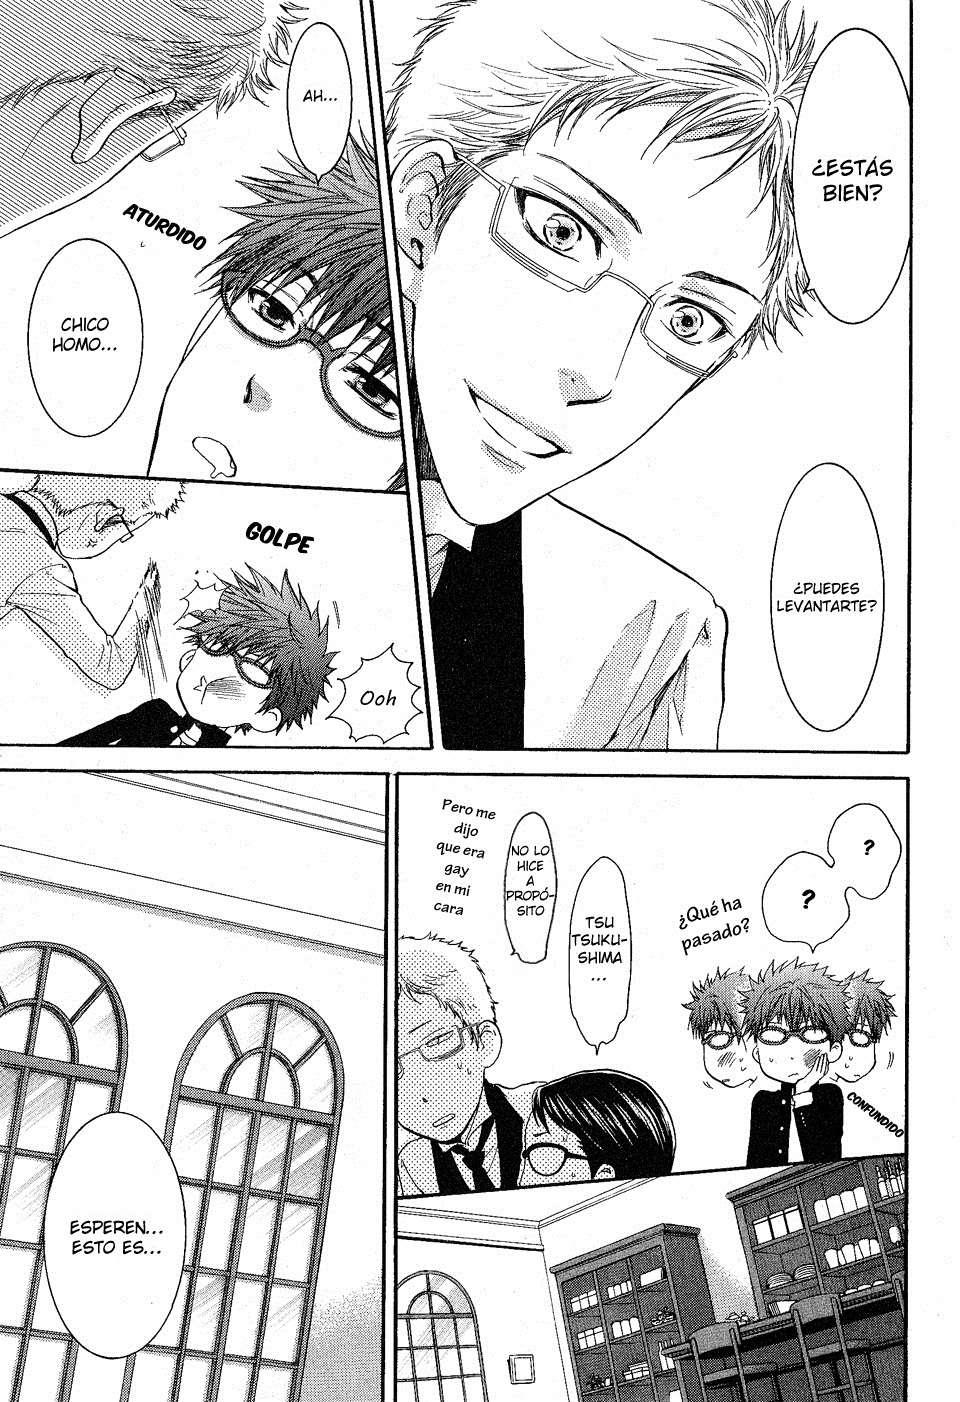 https://c5.ninemanga.com/es_manga/6/15814/378262/d65bffd28c396d6b8b64582fd749730c.jpg Page 36